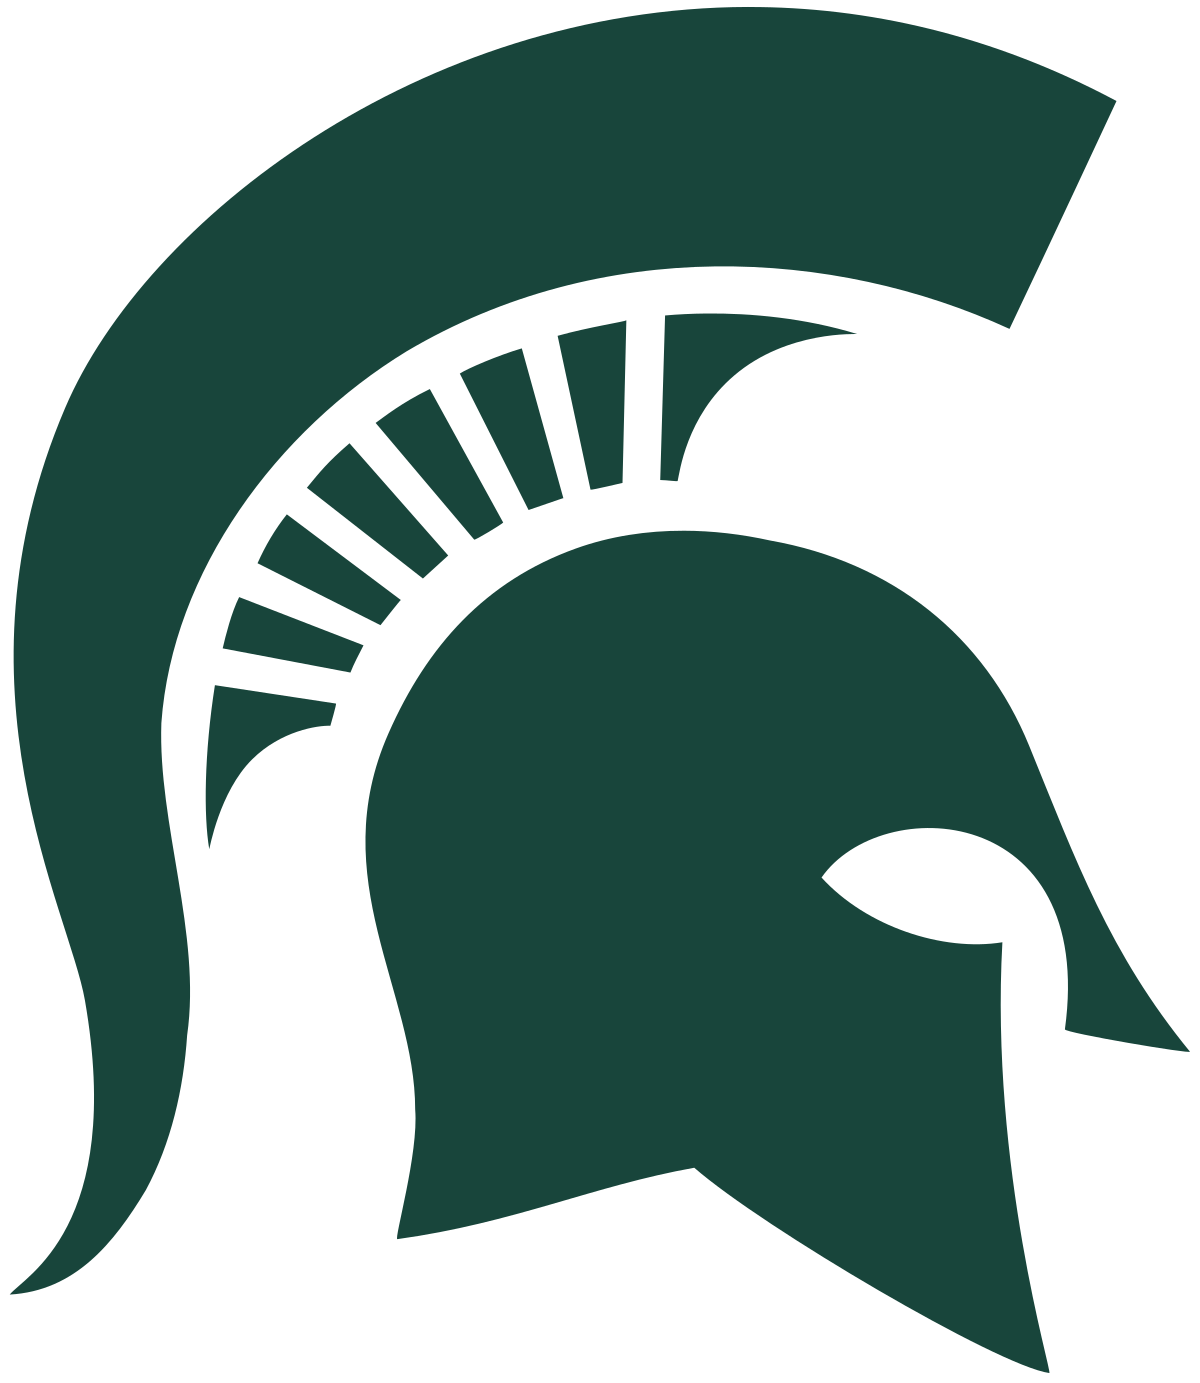 Michigan state spartans wikipedia. Spartan clipart warrior logo